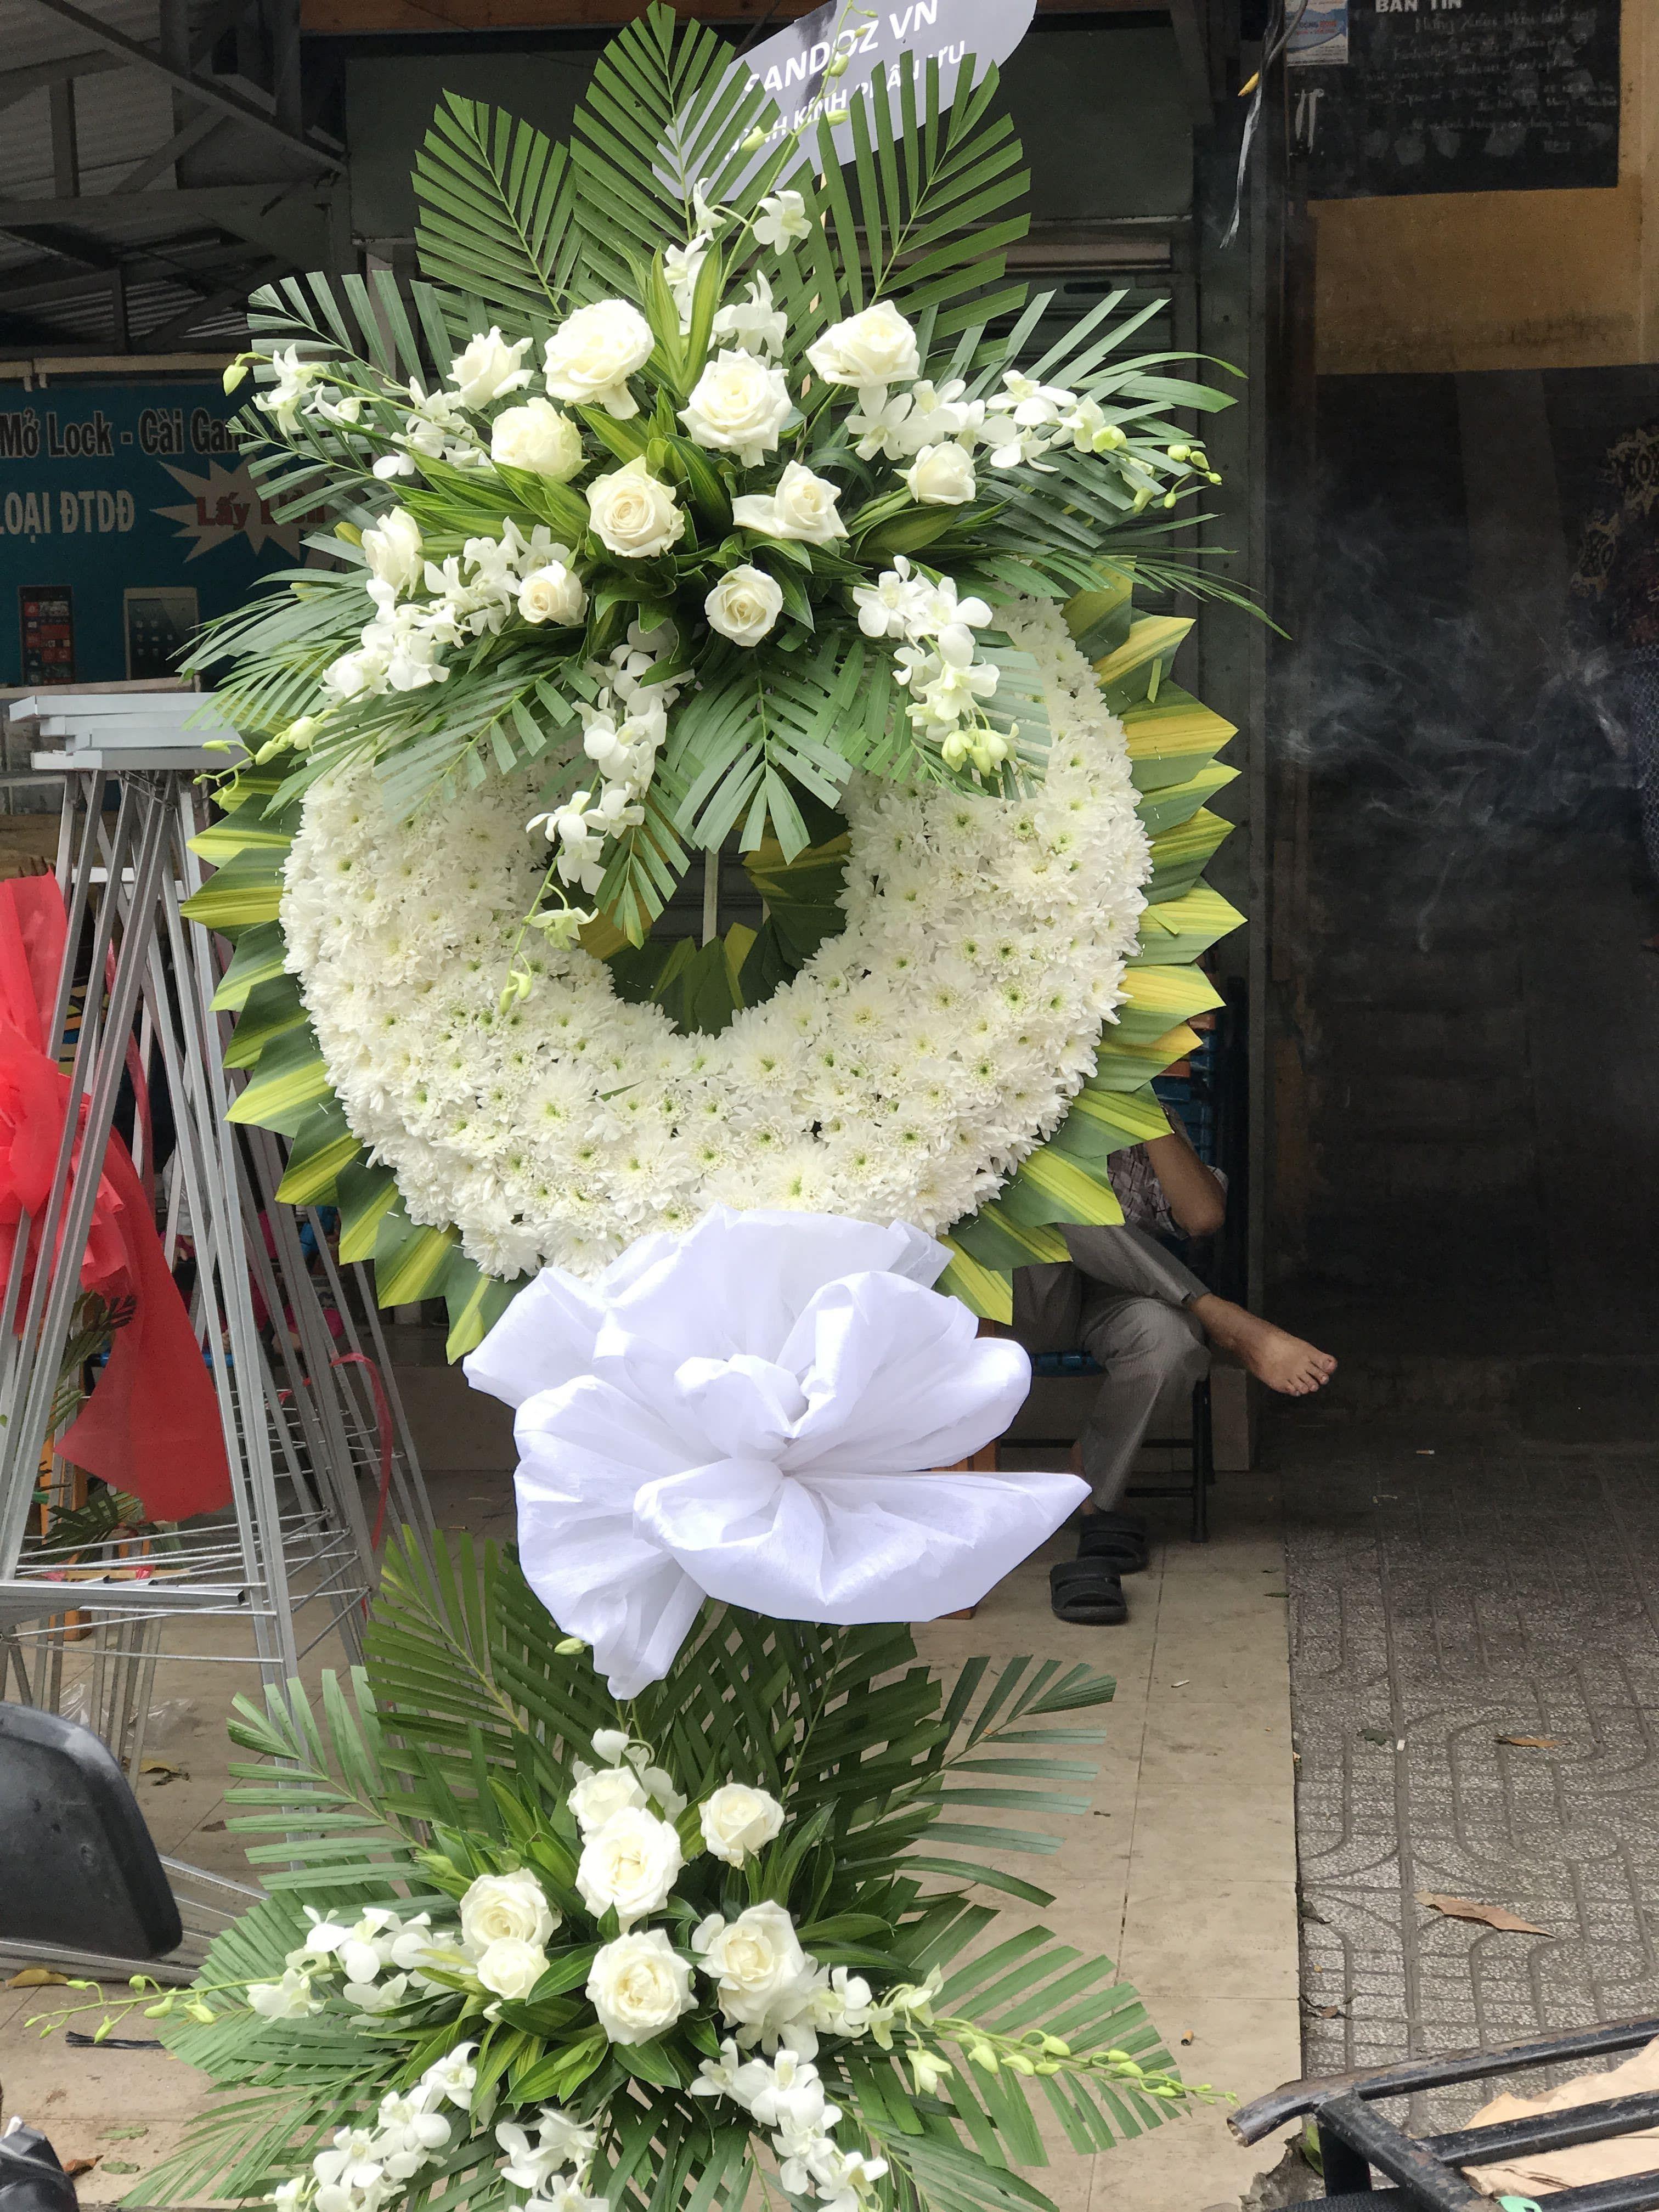 Image result for hoa tang lễ nghệ thuật